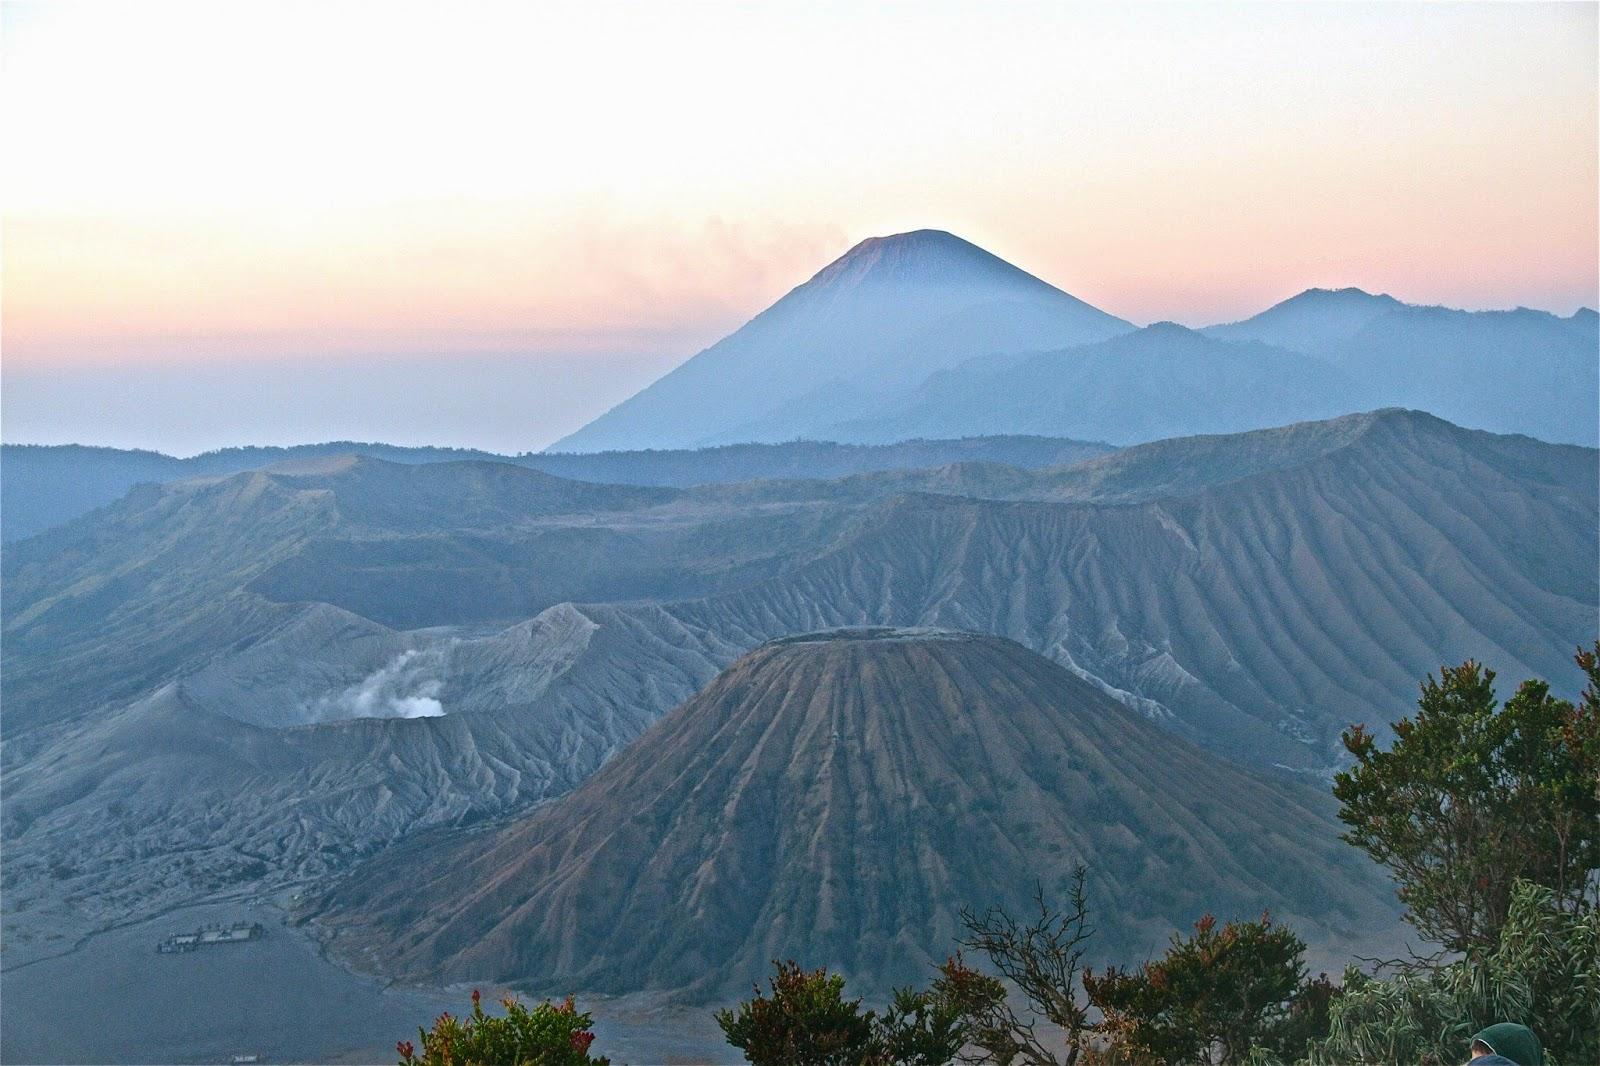 5 Tempat Wisata Probolinggo Bisa Kunjungi 1 Gunung Bromo Taman